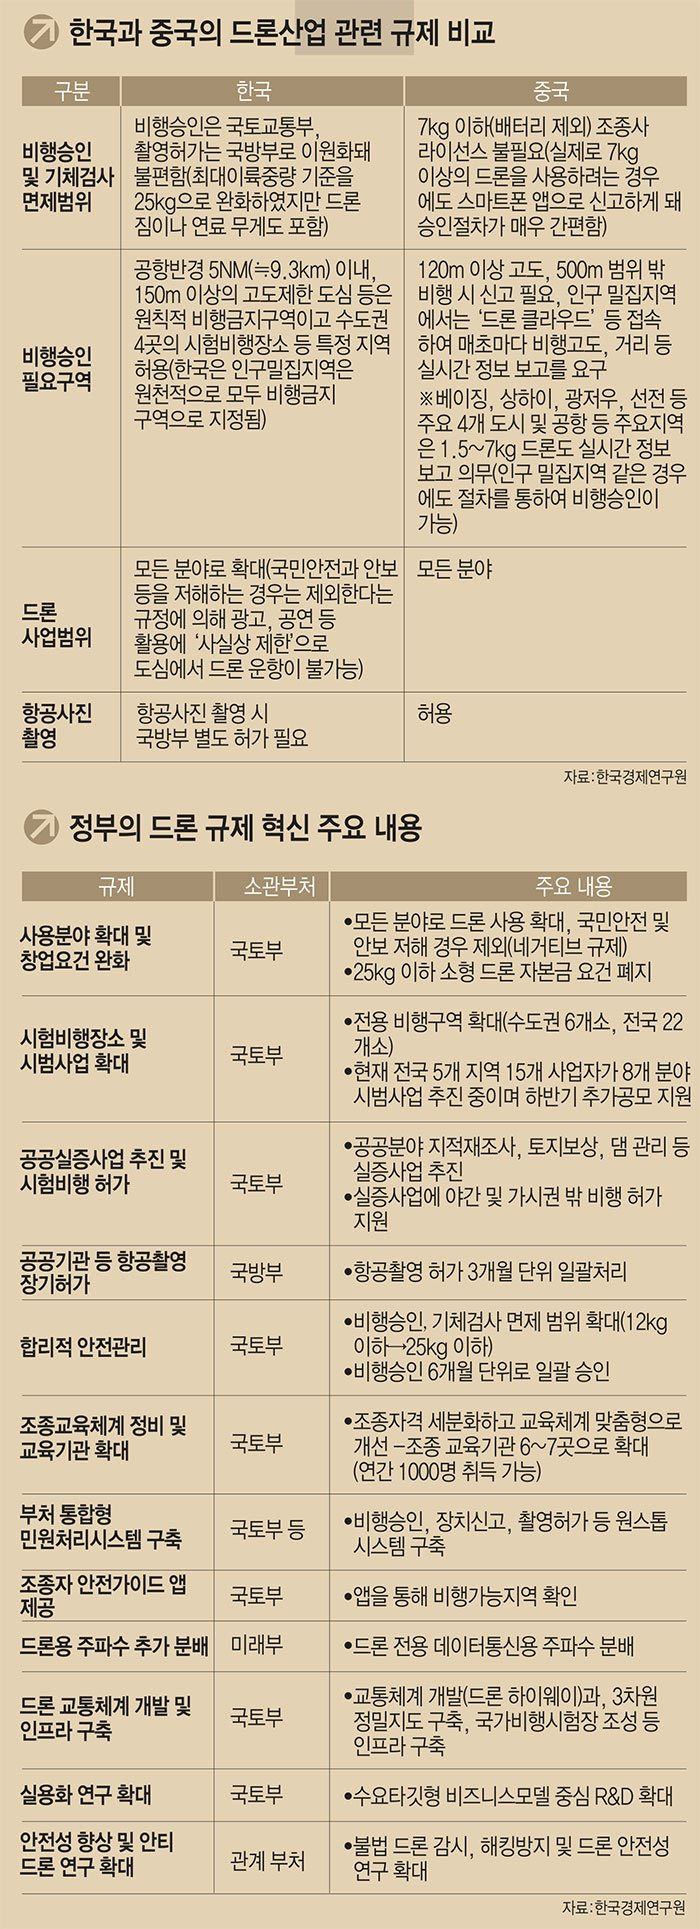 http://img.etnews.com/news/article/2017/04/03/article_03184253592407.jpg